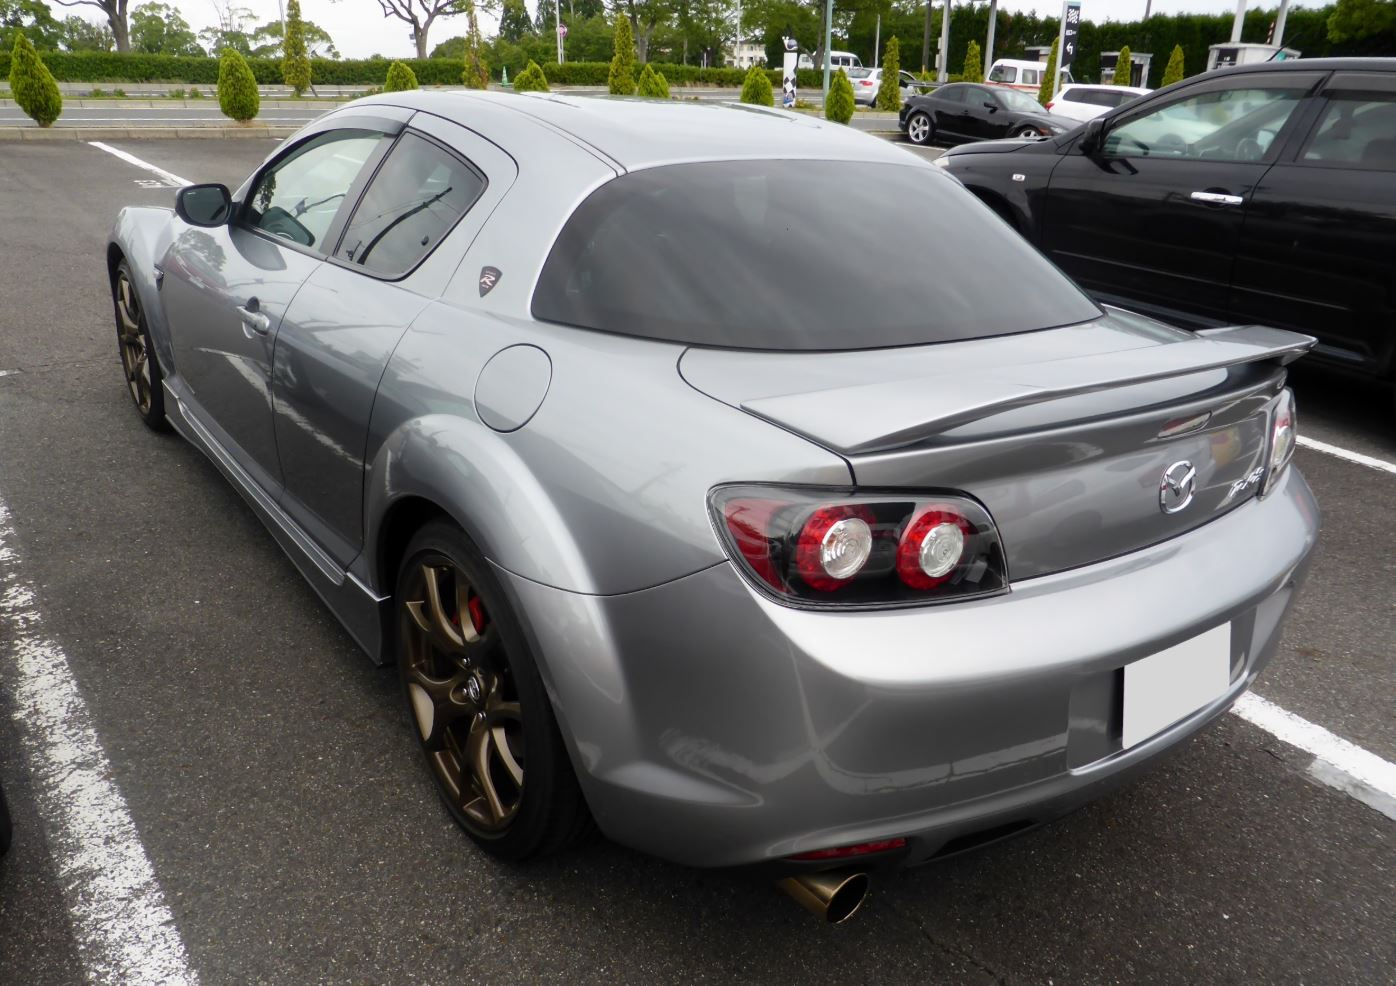 Ultimate Mazda Rx 8 Buyers Guide History Garage Dreams